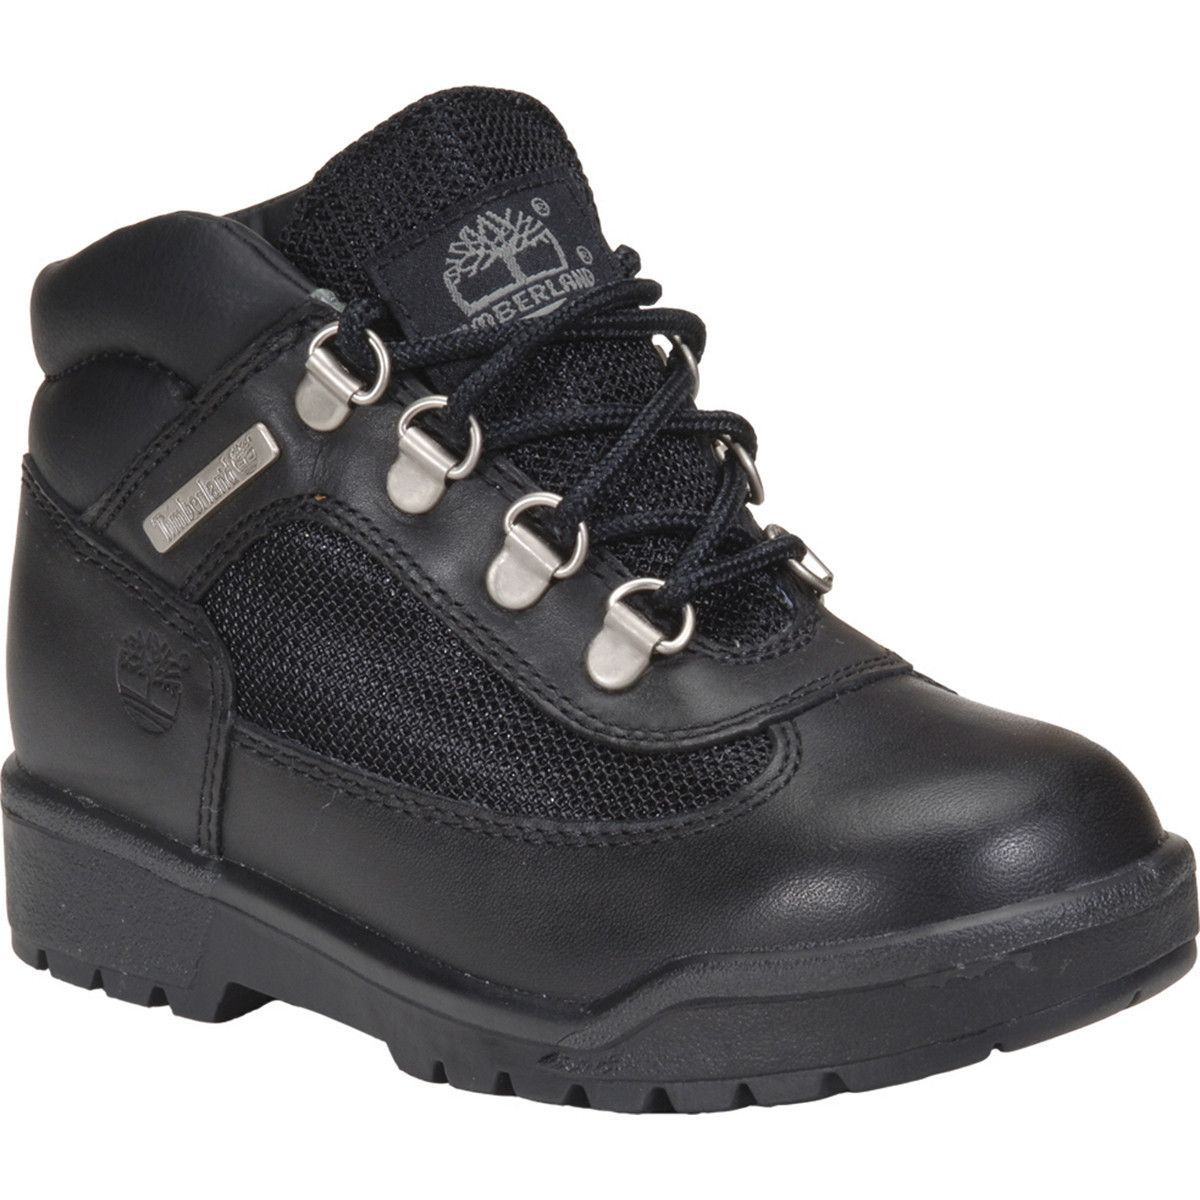 Timberland - Waterproof Field Hiking Boot (Little Kid) - Black Smooth